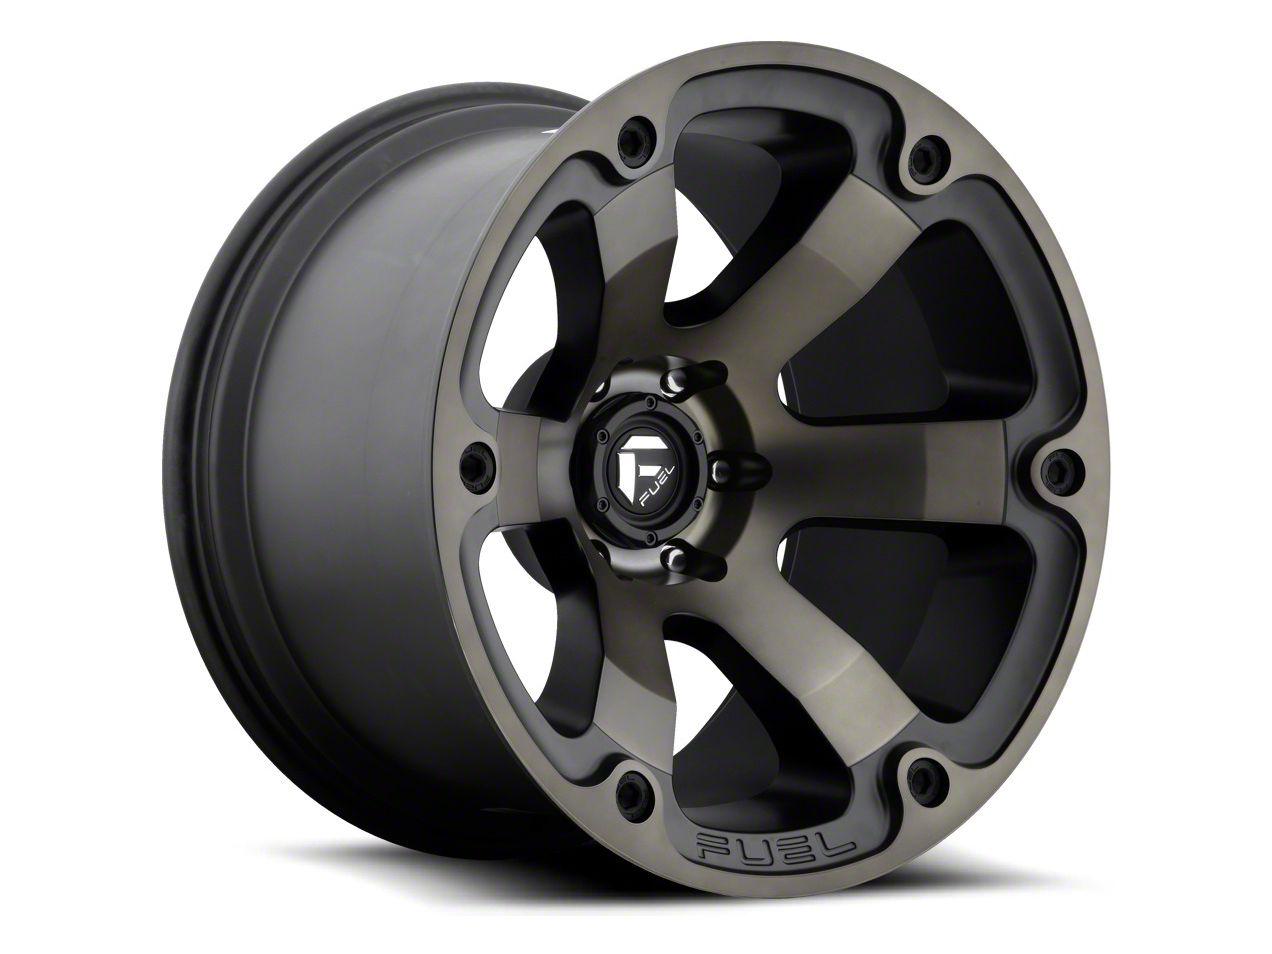 Fuel Wheels Beast Matte Black Machined 6-Lug Wheel - 22x12 (04-19 F-150)